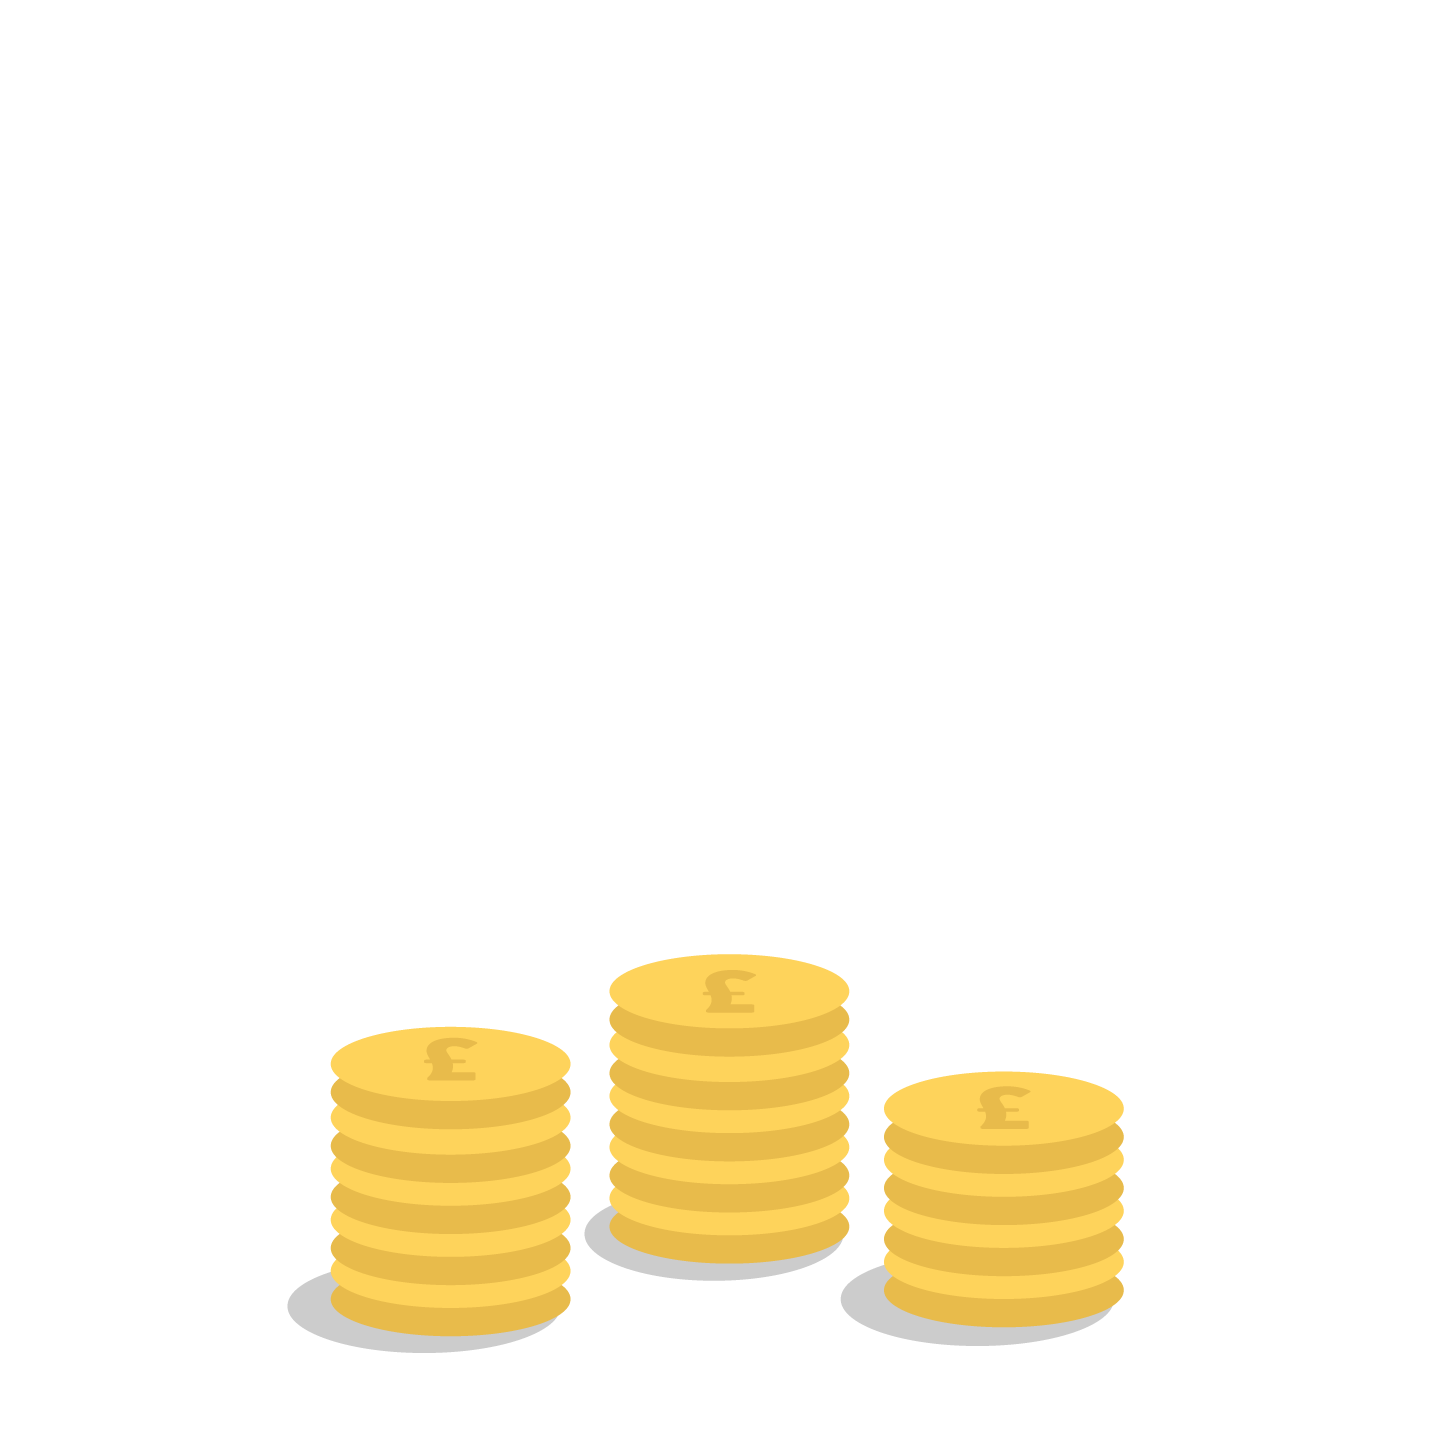 three stacks of pound coins